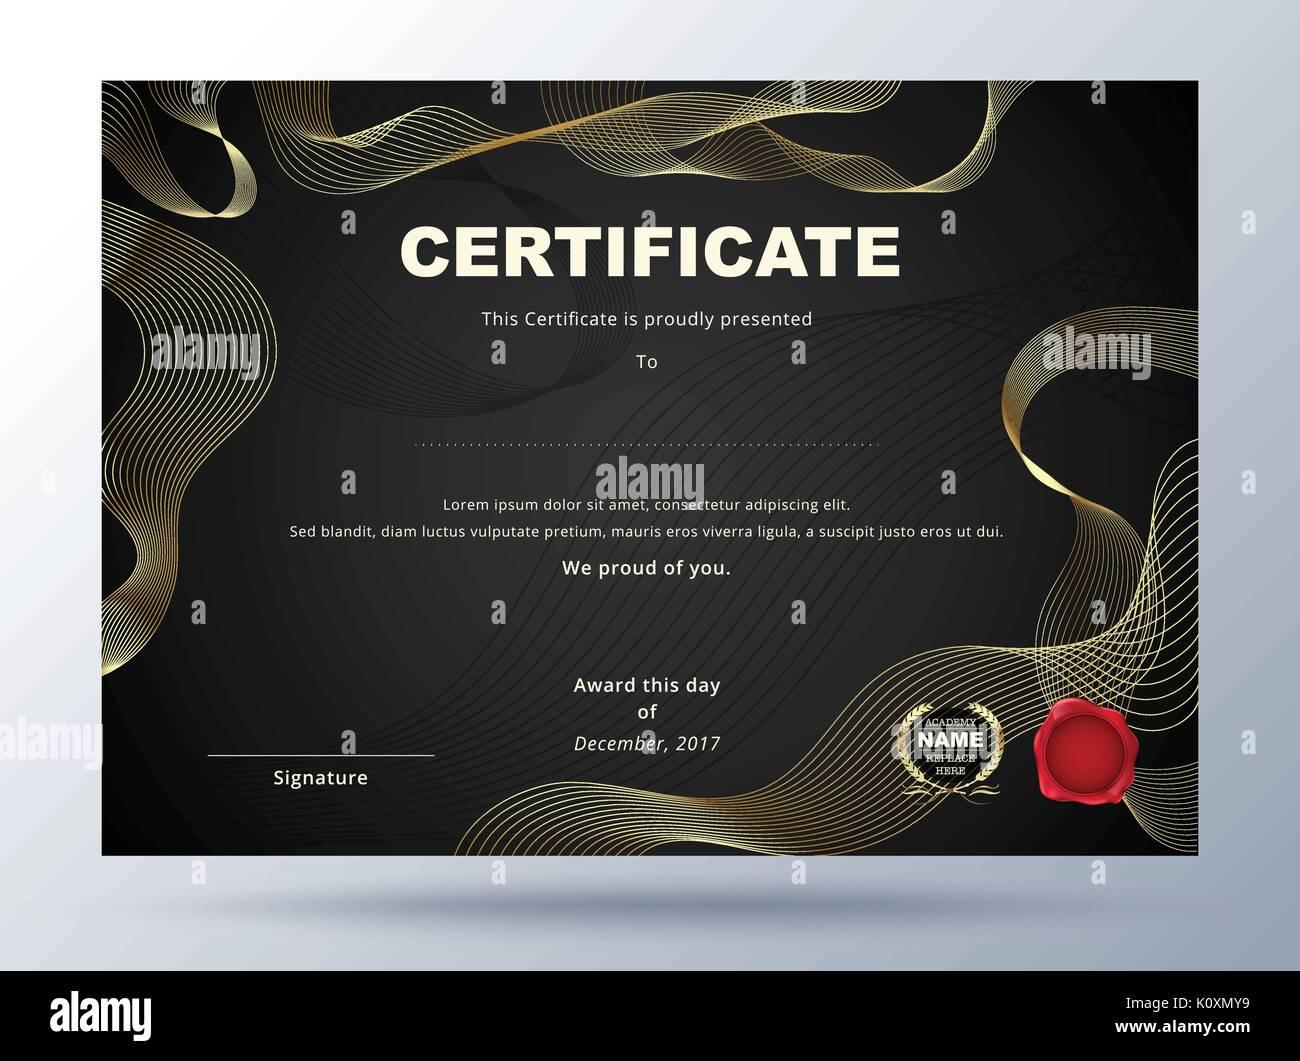 Elegant appreciation certificate template design stock photos certificate template design with simple concept business certificate design stock image xflitez Images